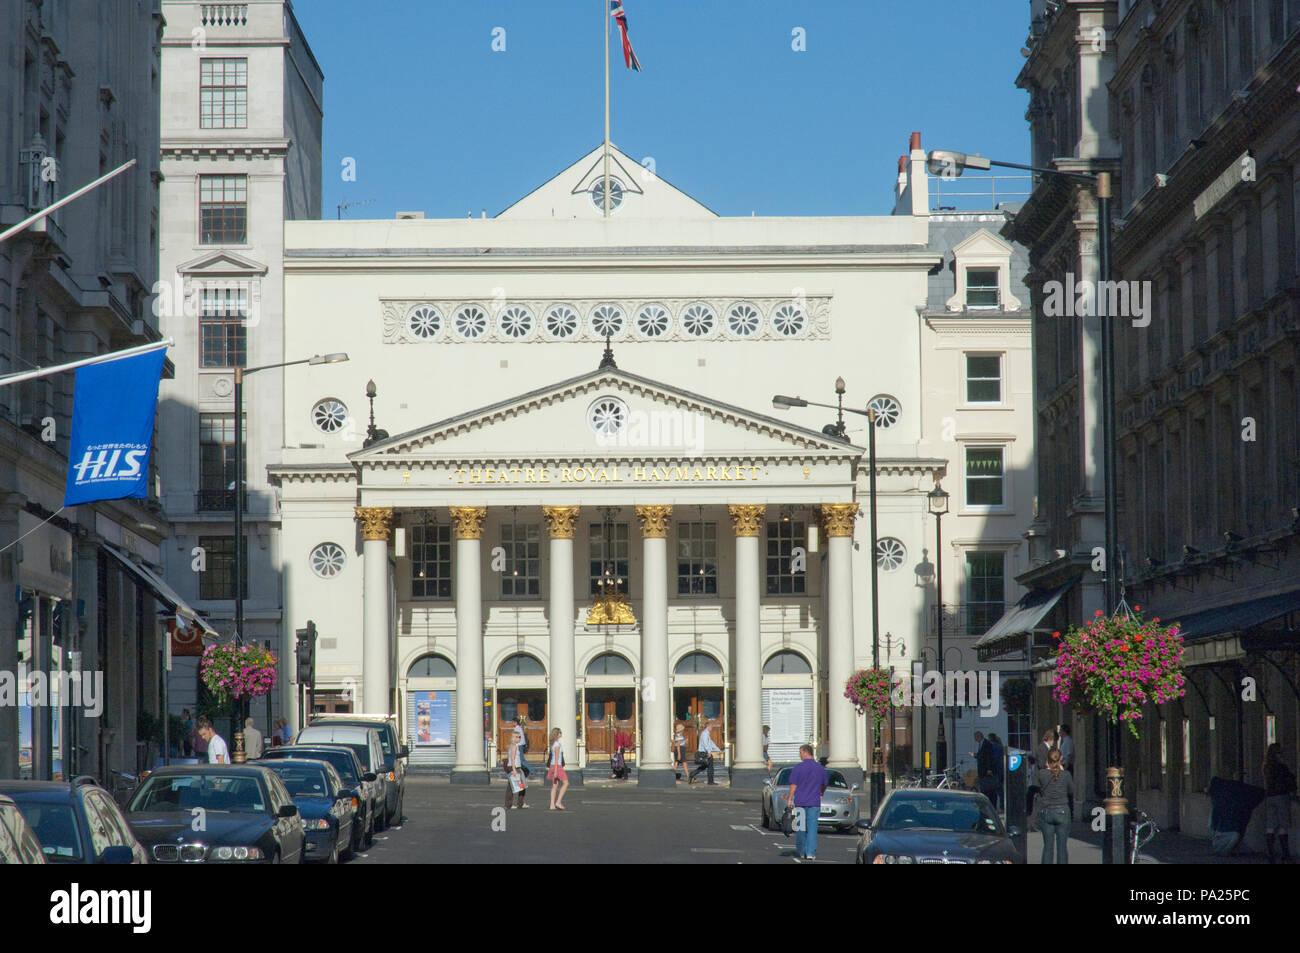 Theatre Royal Haymarket London - Stock Image